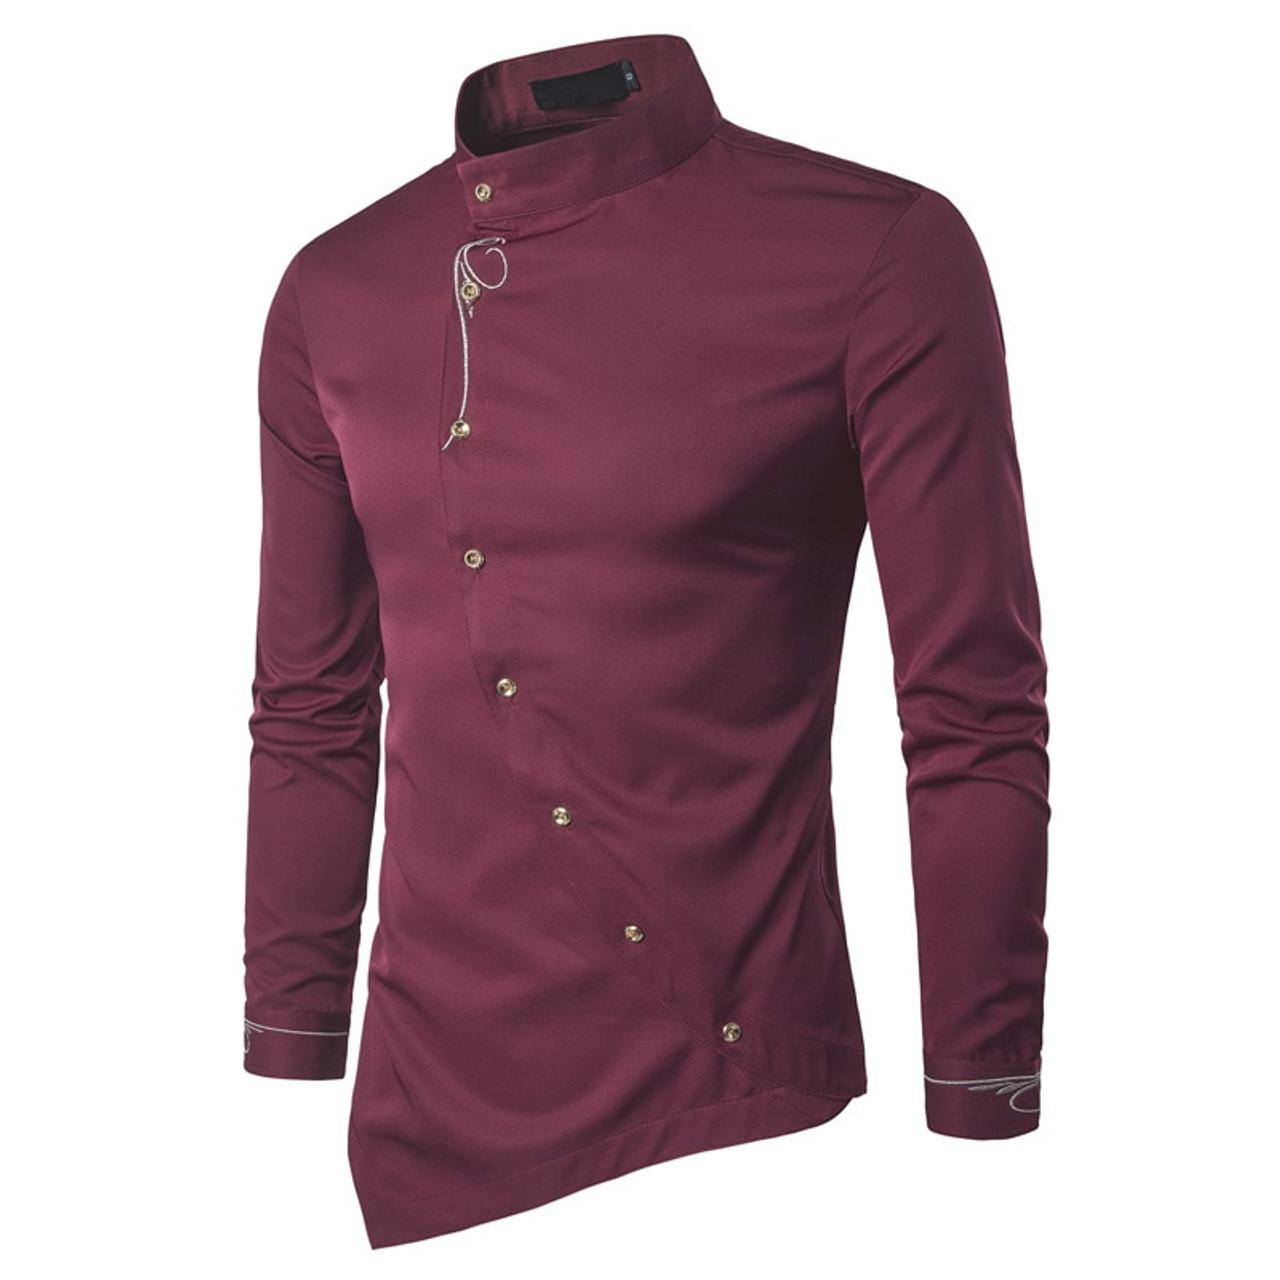 2018 Fashion New Male Shirt Long Sleeve Mens Clothes Oblique Button Dress  Shirts Mandarin Collar Men Tuxedo Shirts - OnshopDeals.Com